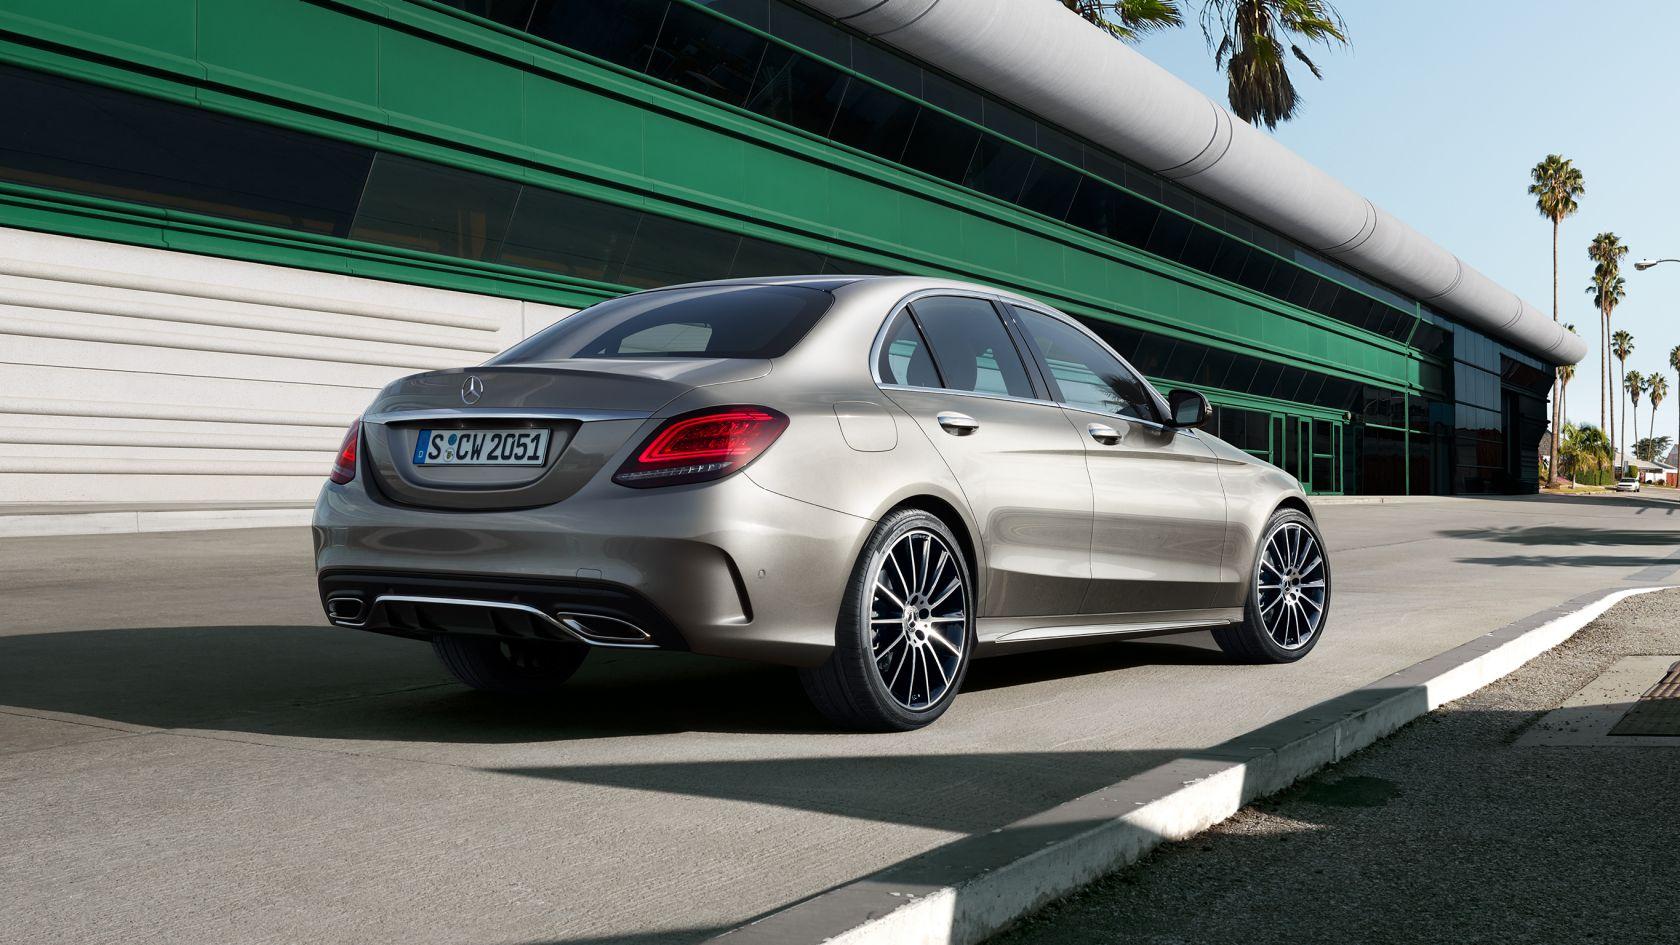 Mercedes Classe C maggior successo